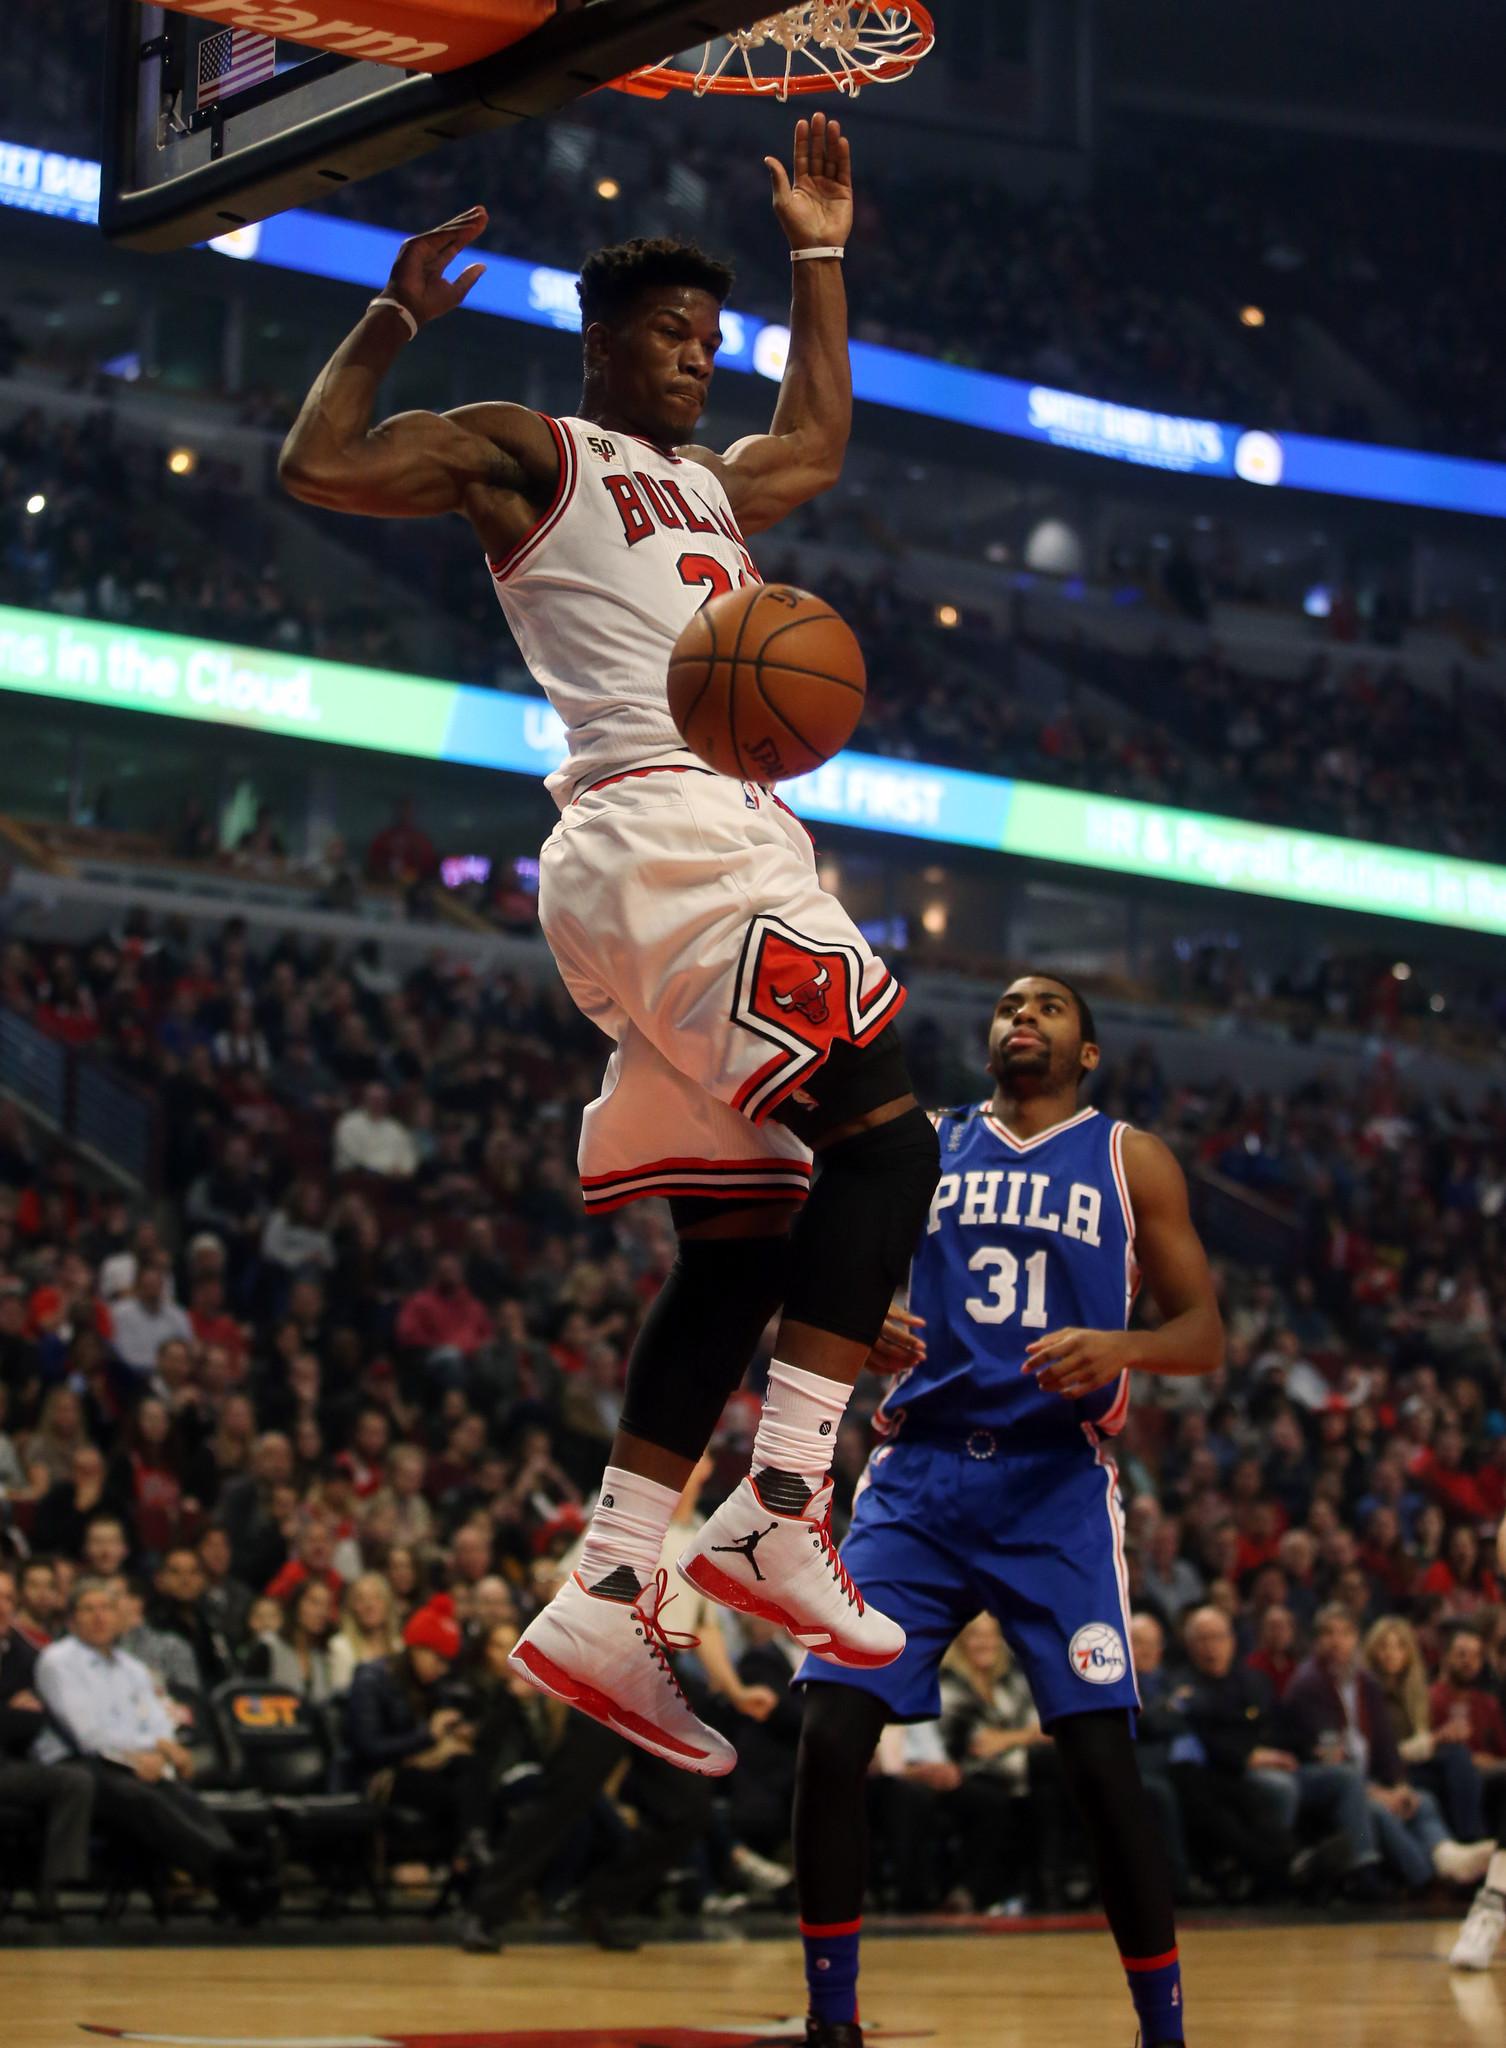 Jimmy Butler throwing down a dunk - Chicago Bulls